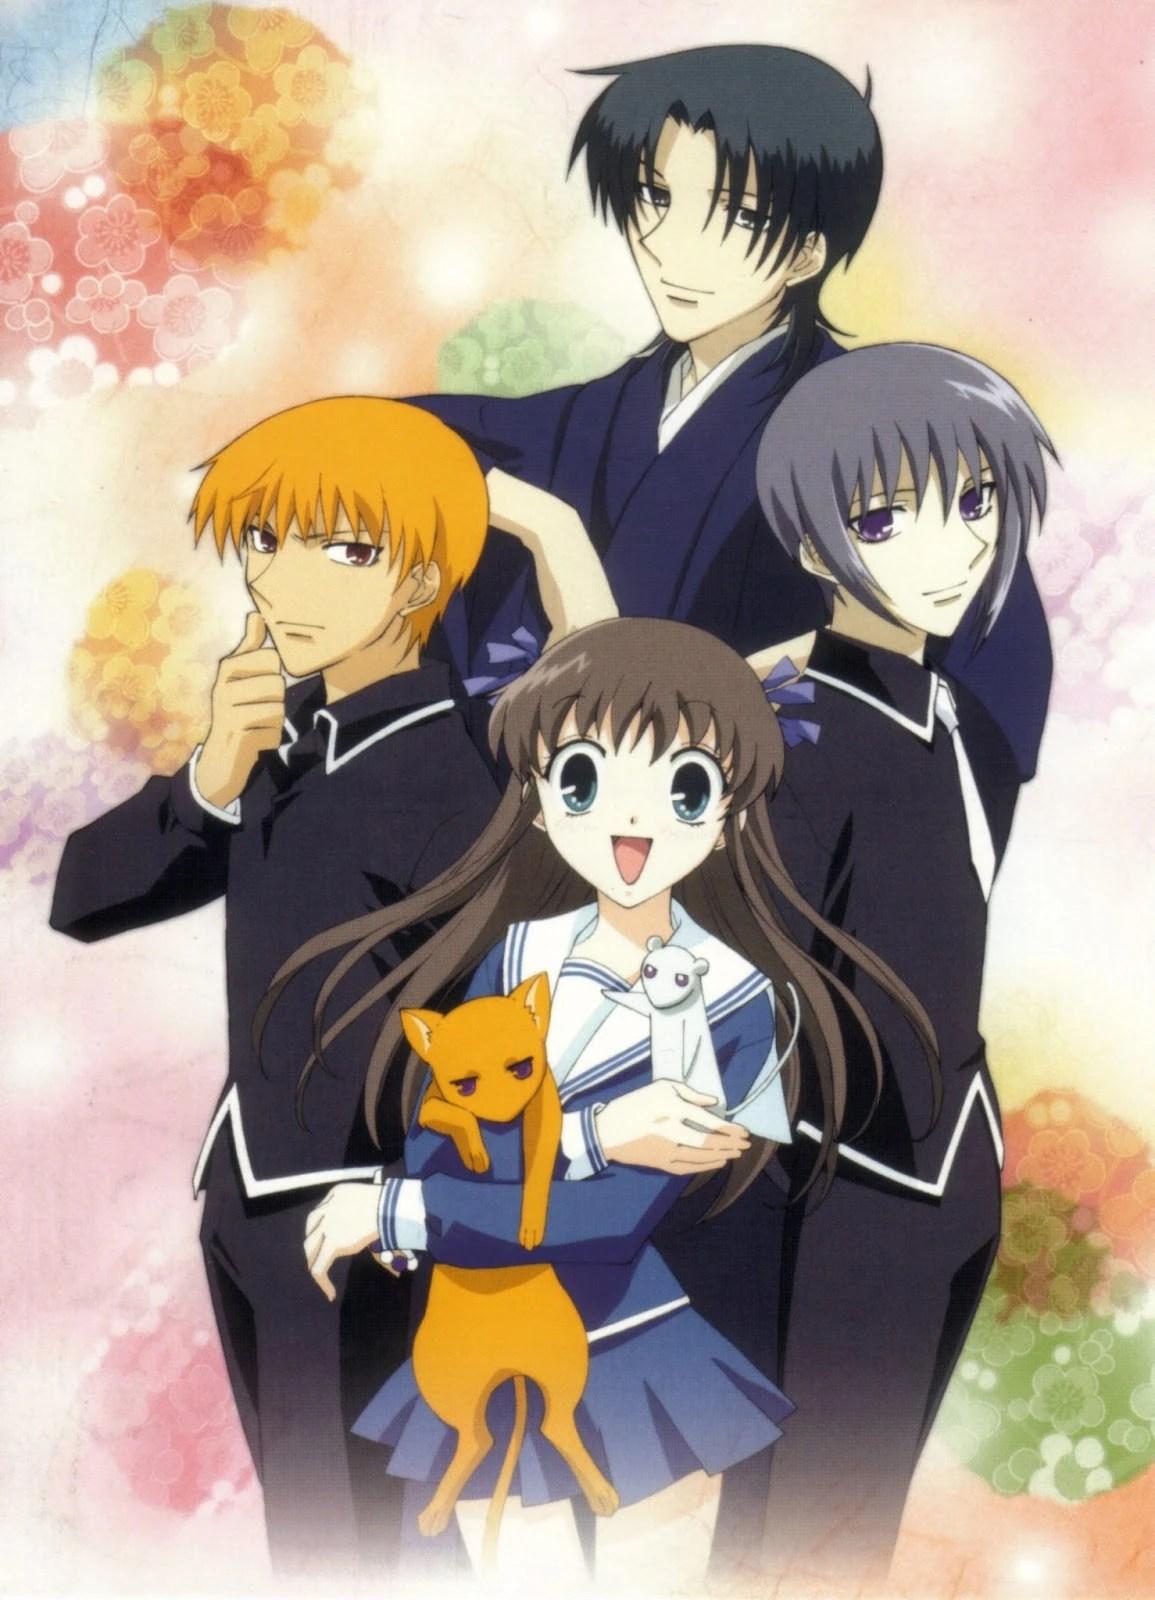 Fruits Basket 2019 02 Vostfr : fruits, basket, vostfr, Fruits, Basket, (2001, Anime), Japanese, Anime, Fandom